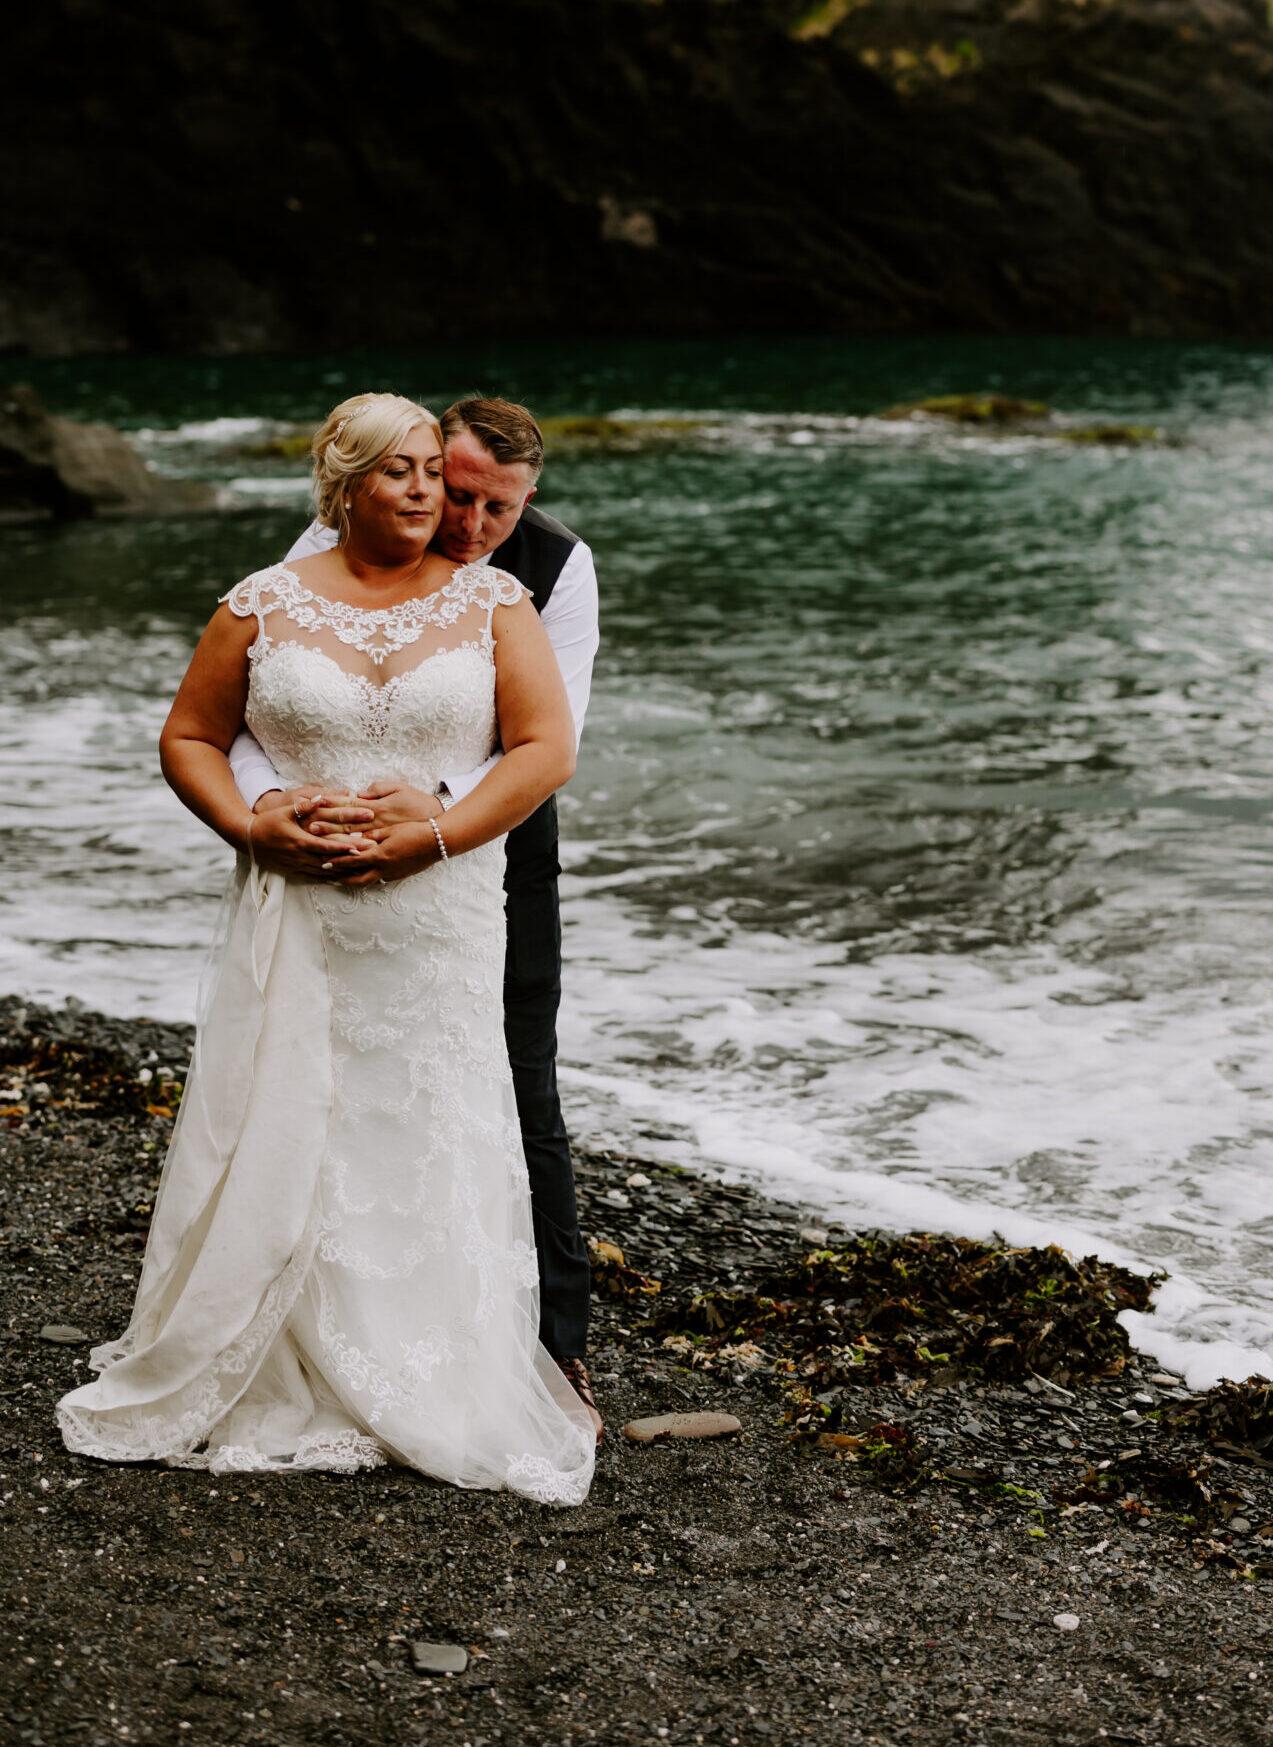 romantic beach image of bride and groom at Devon wedding